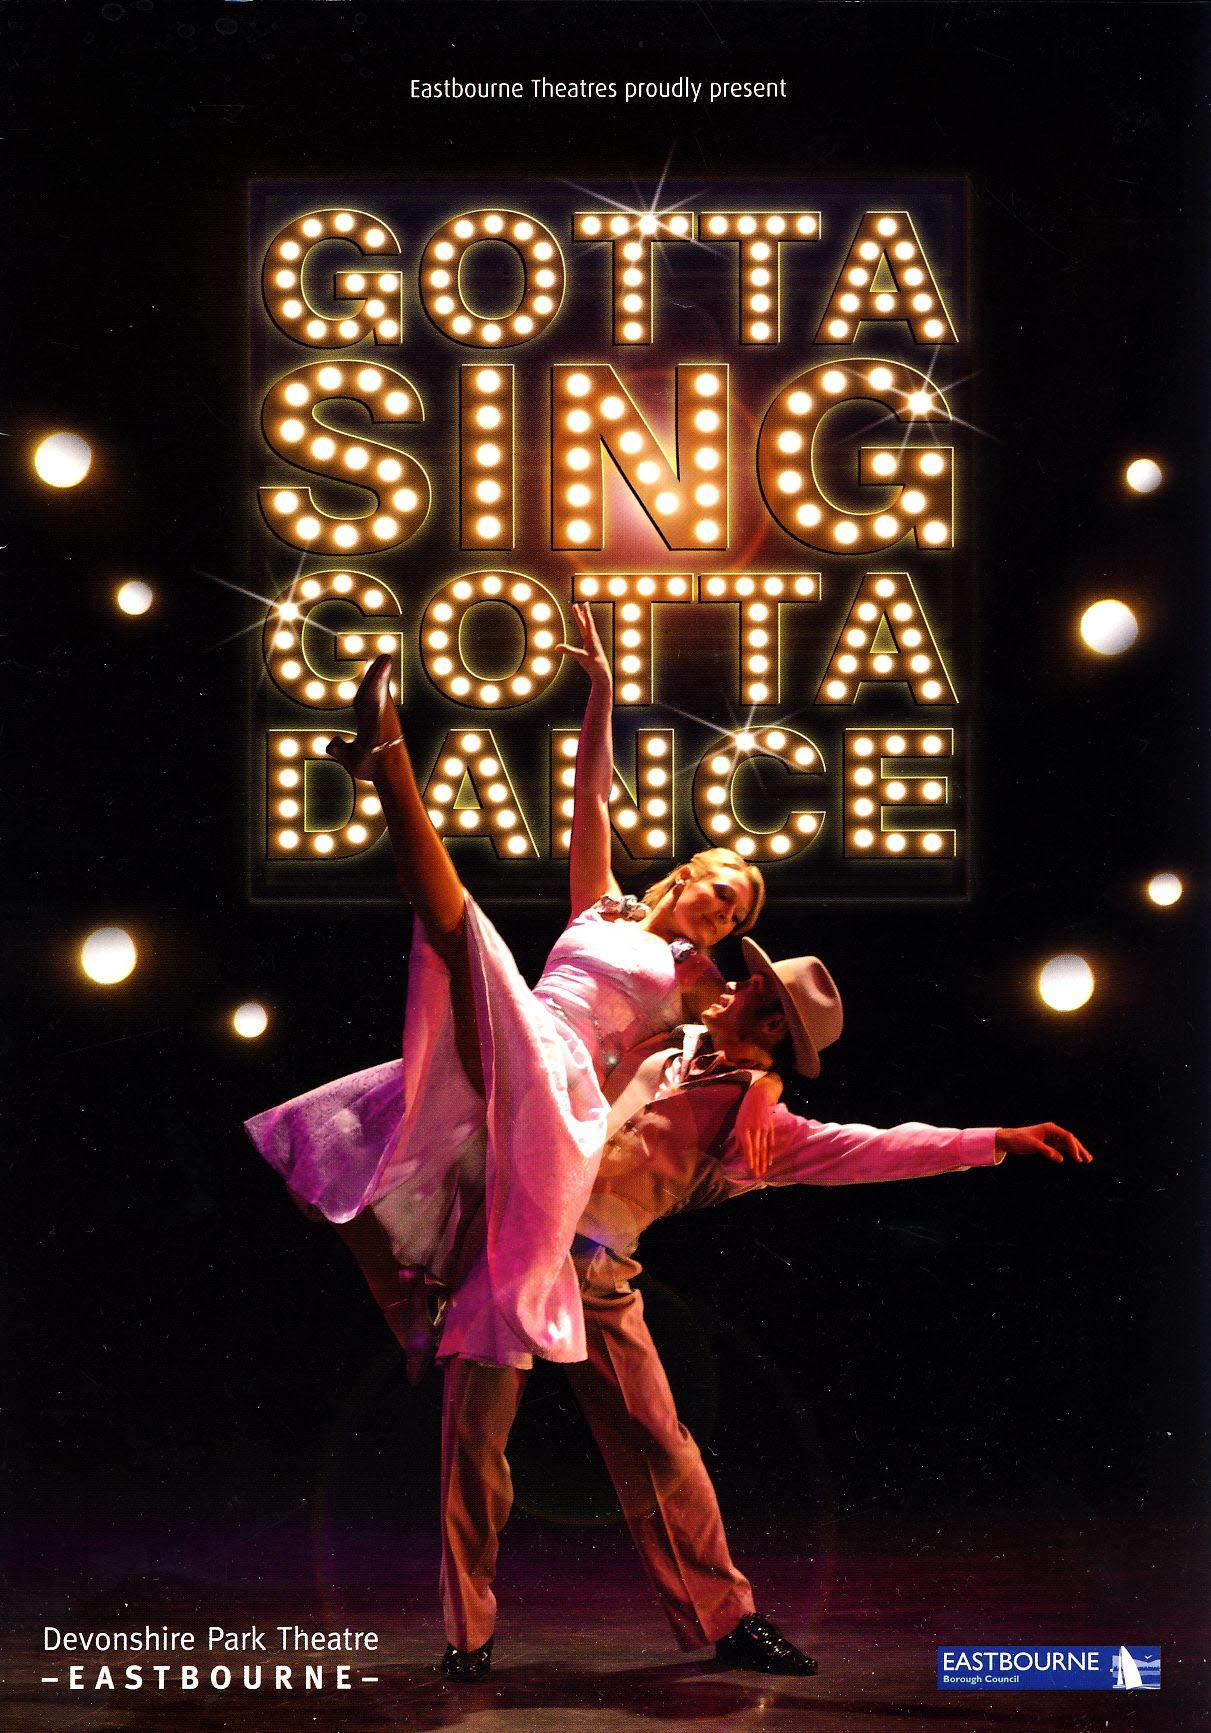 Gotta Sing Gotta Dance 2009 EASTBOURNE Devonshire Park Theatre Programme refb101201 Pre-owned Programme in Good Condition. Measures approx 21cm x 29.5cm